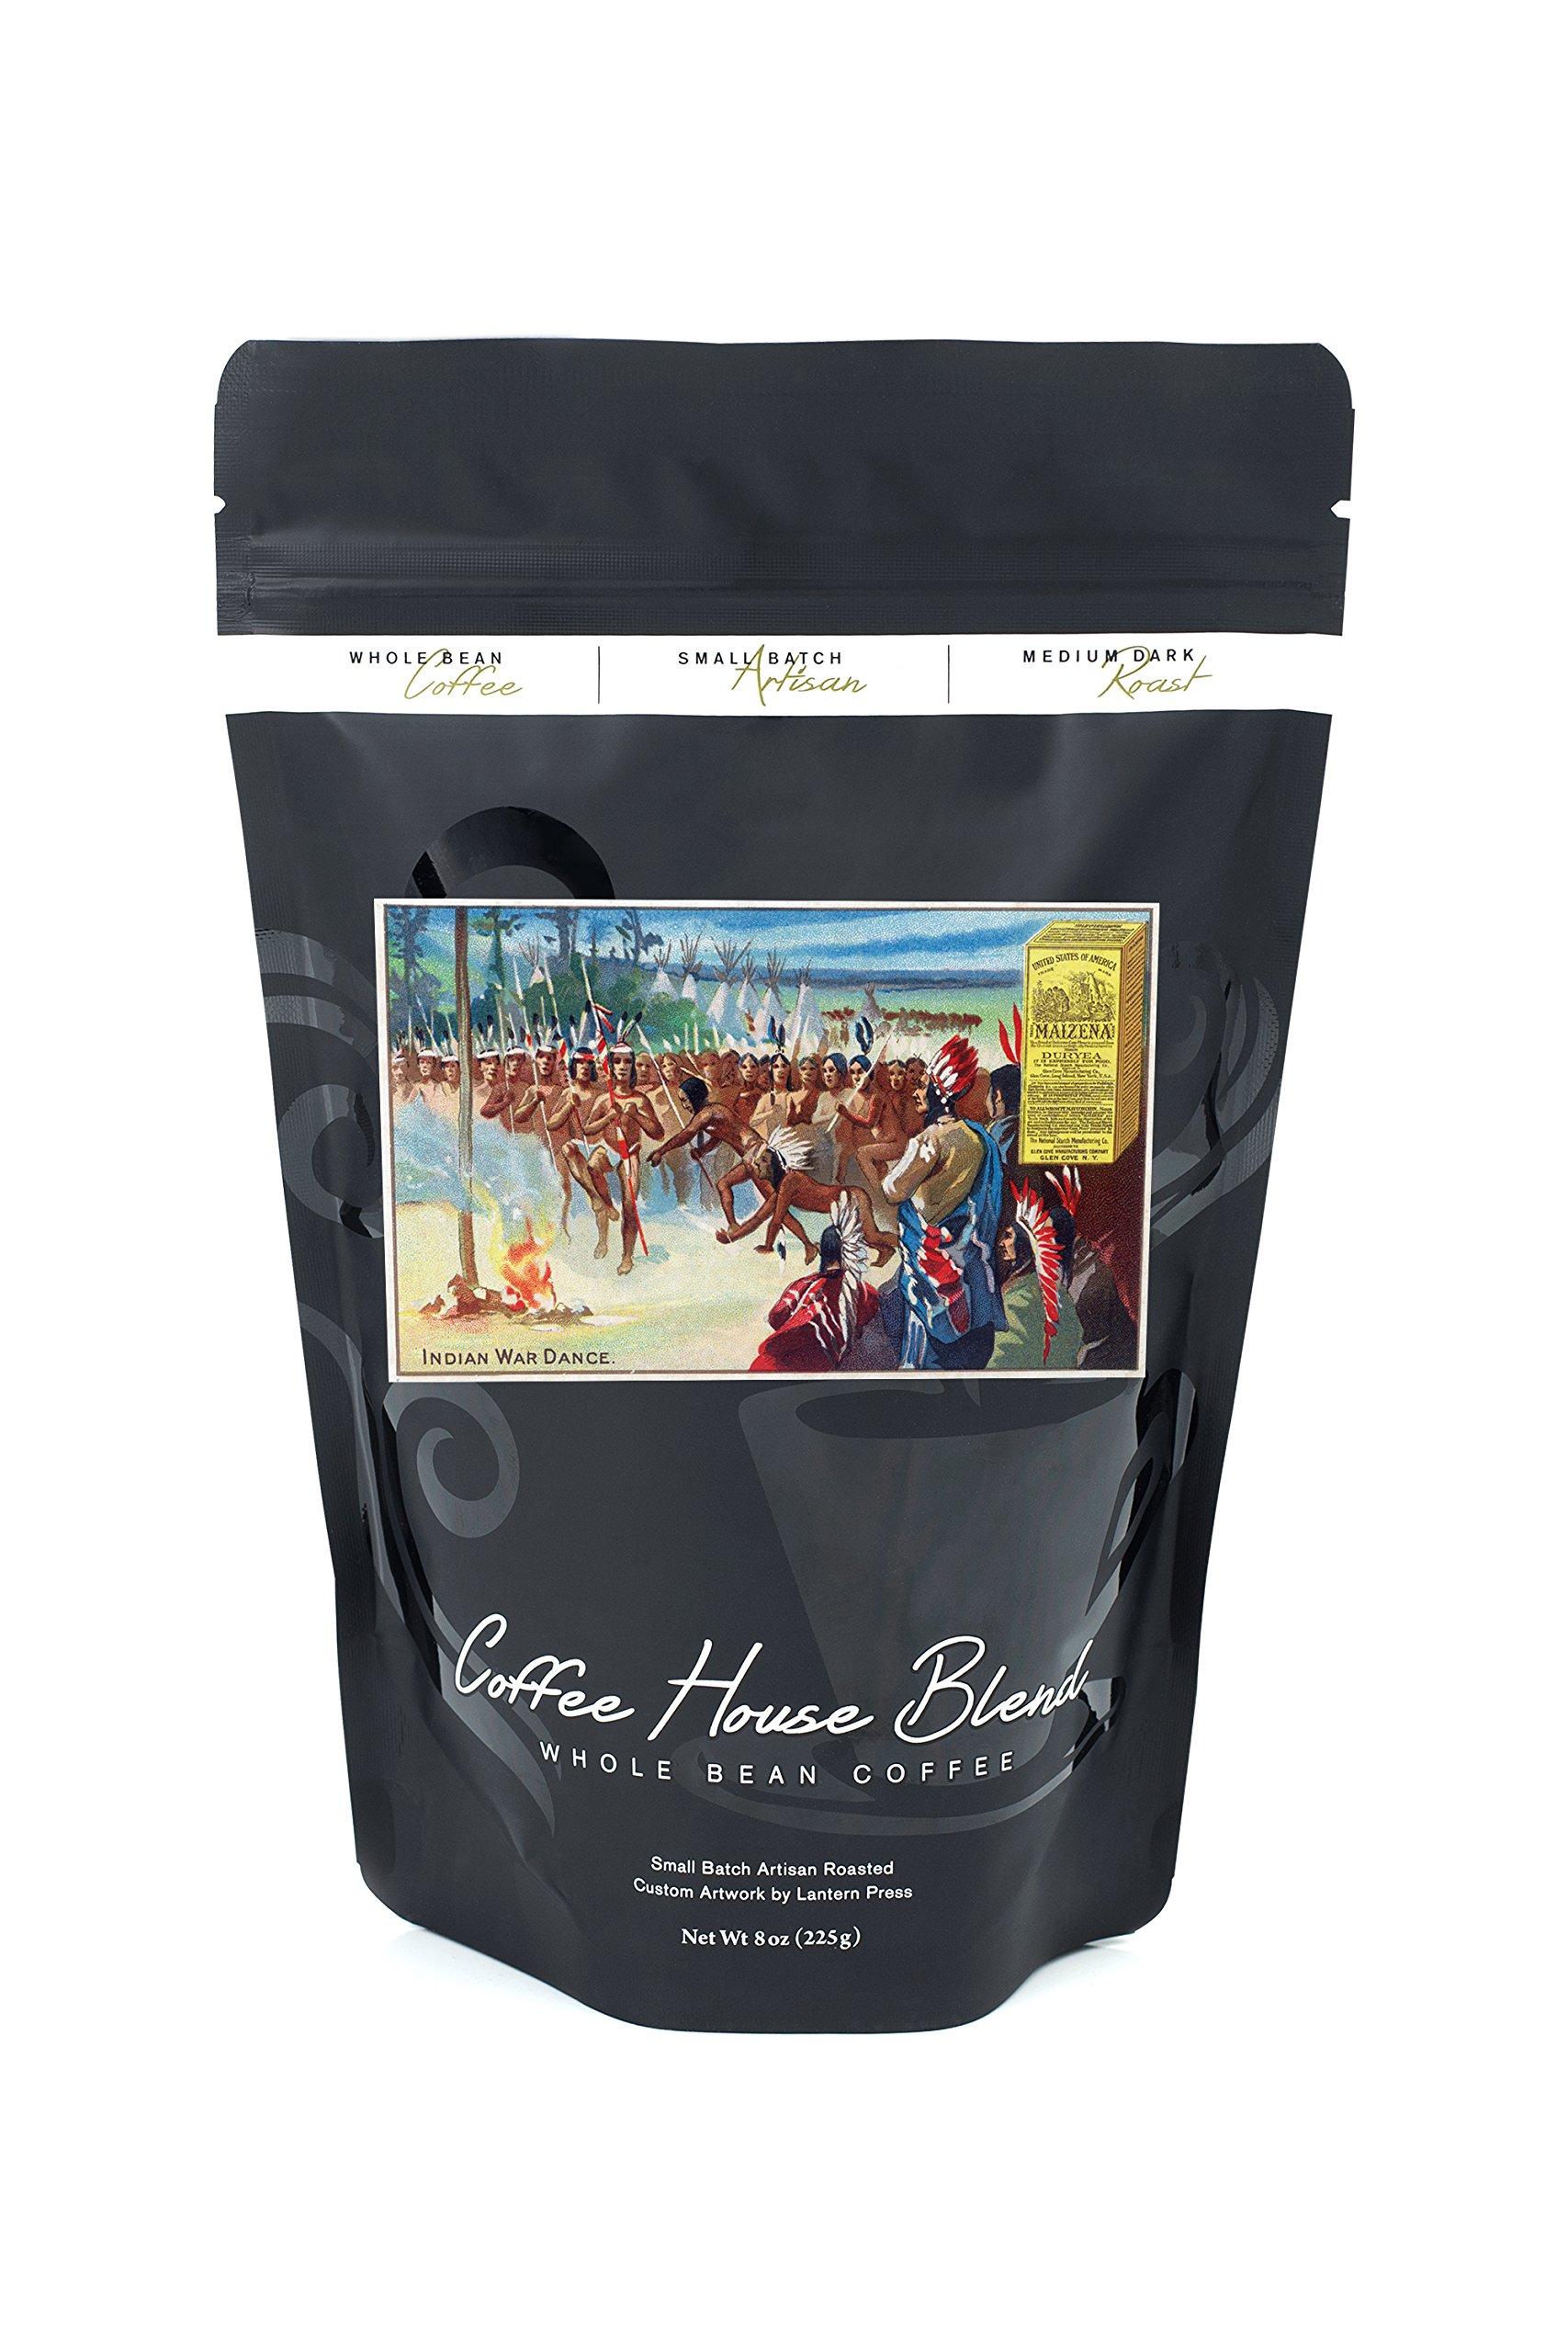 View of an Indian Dance, Maizena Product Ad (8oz Whole Bean Small Batch Artisan Coffee - Bold & Strong Medium Dark Roast w/ Artwork)